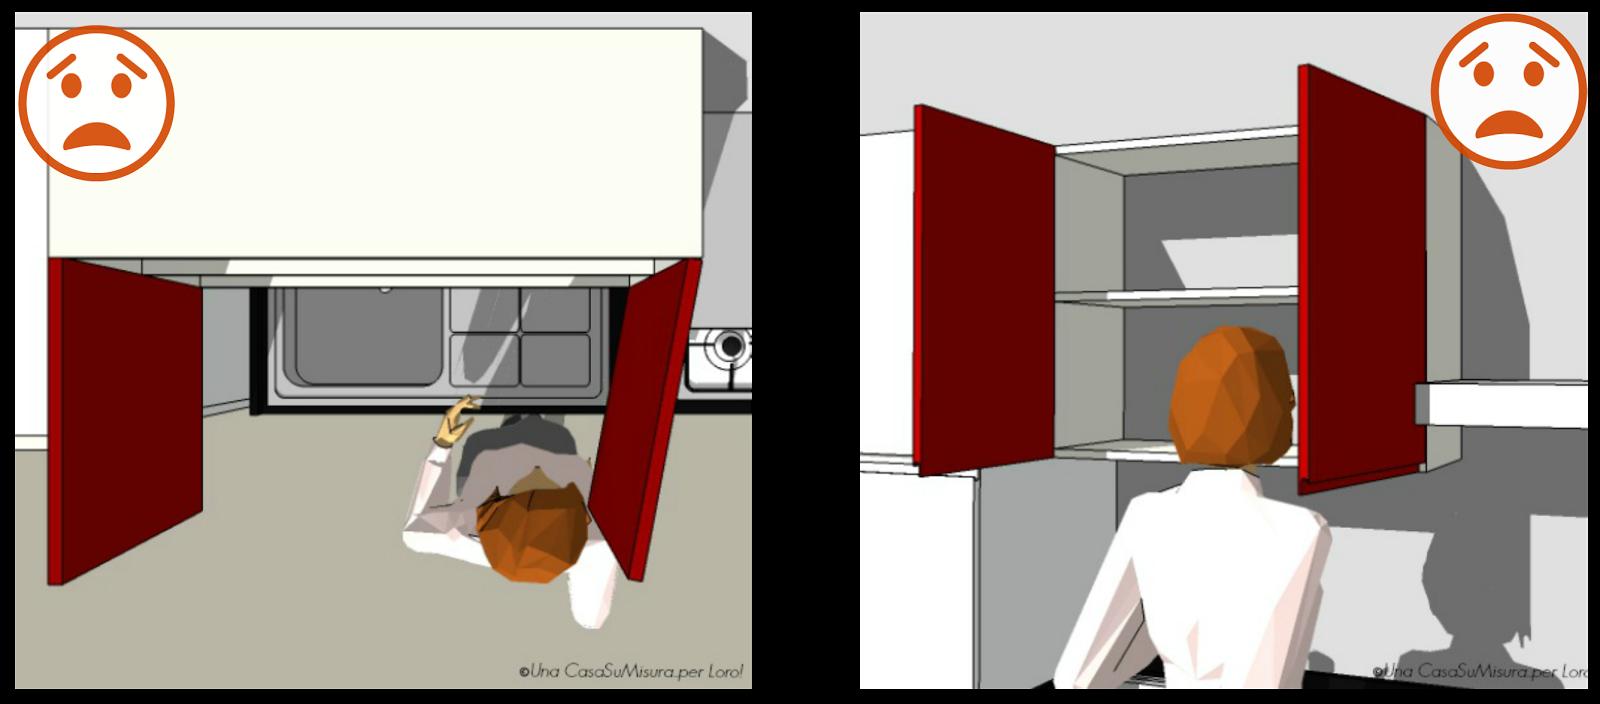 Una casasumisura per loro una cucina funzionale - Altezze pensili cucina ...